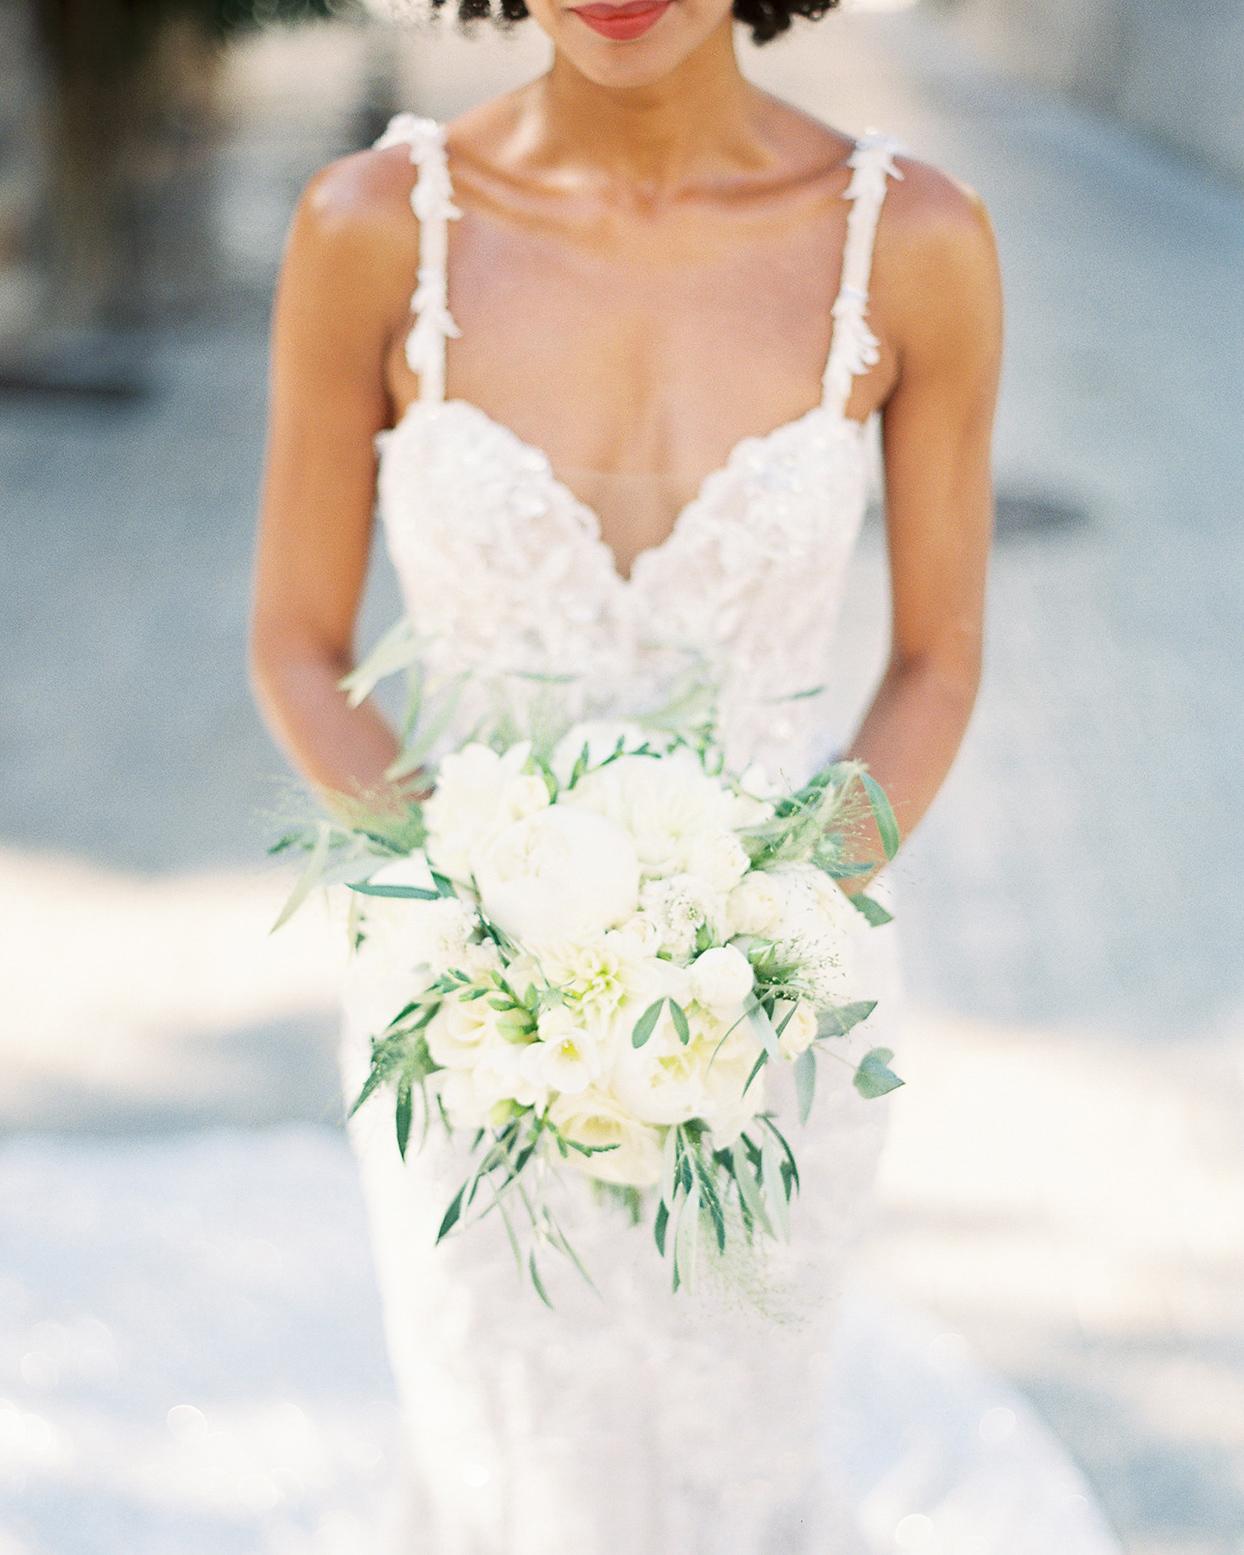 patricia ralph bride's white wedding bouquet